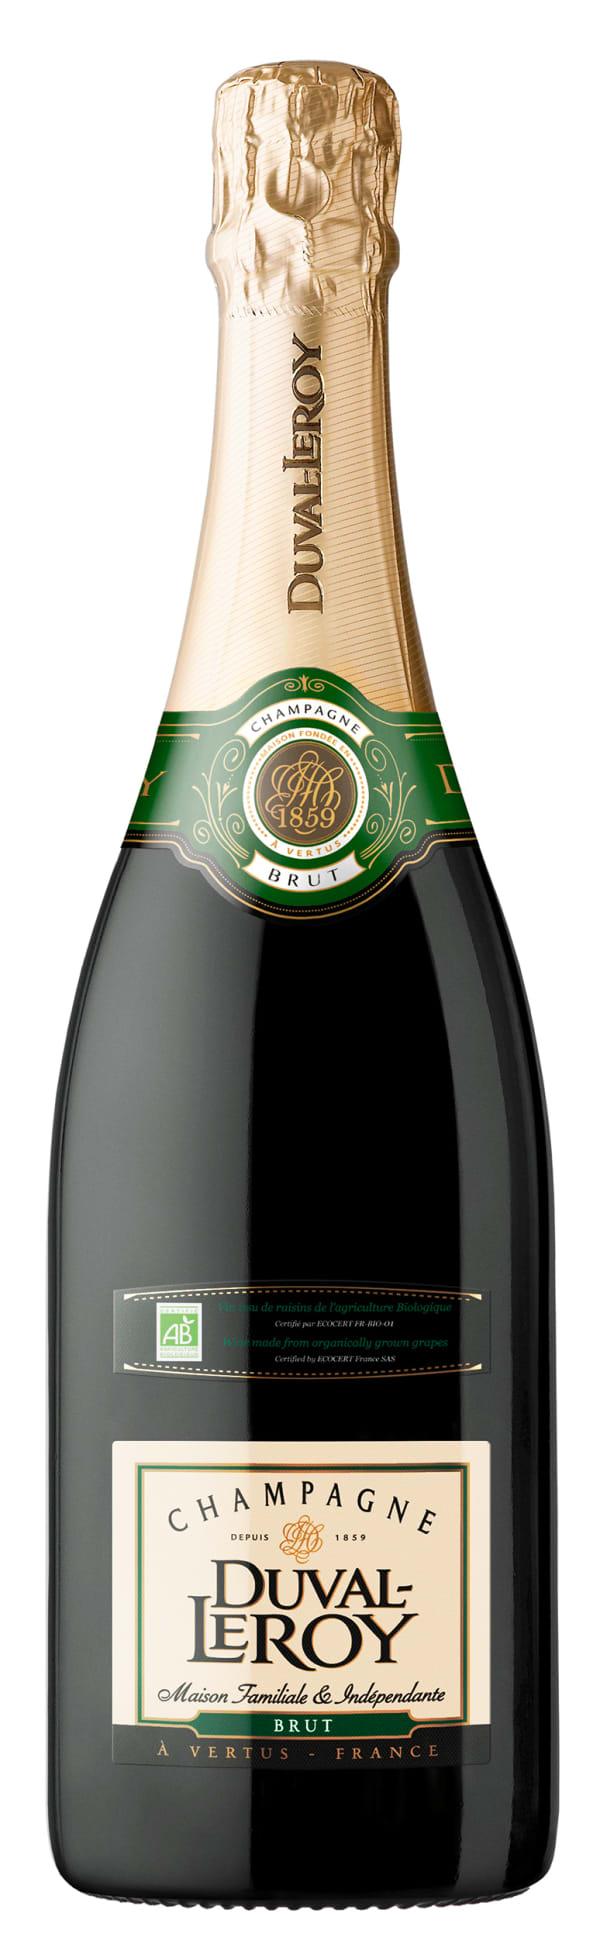 Duval-Leroy Champagne Brut